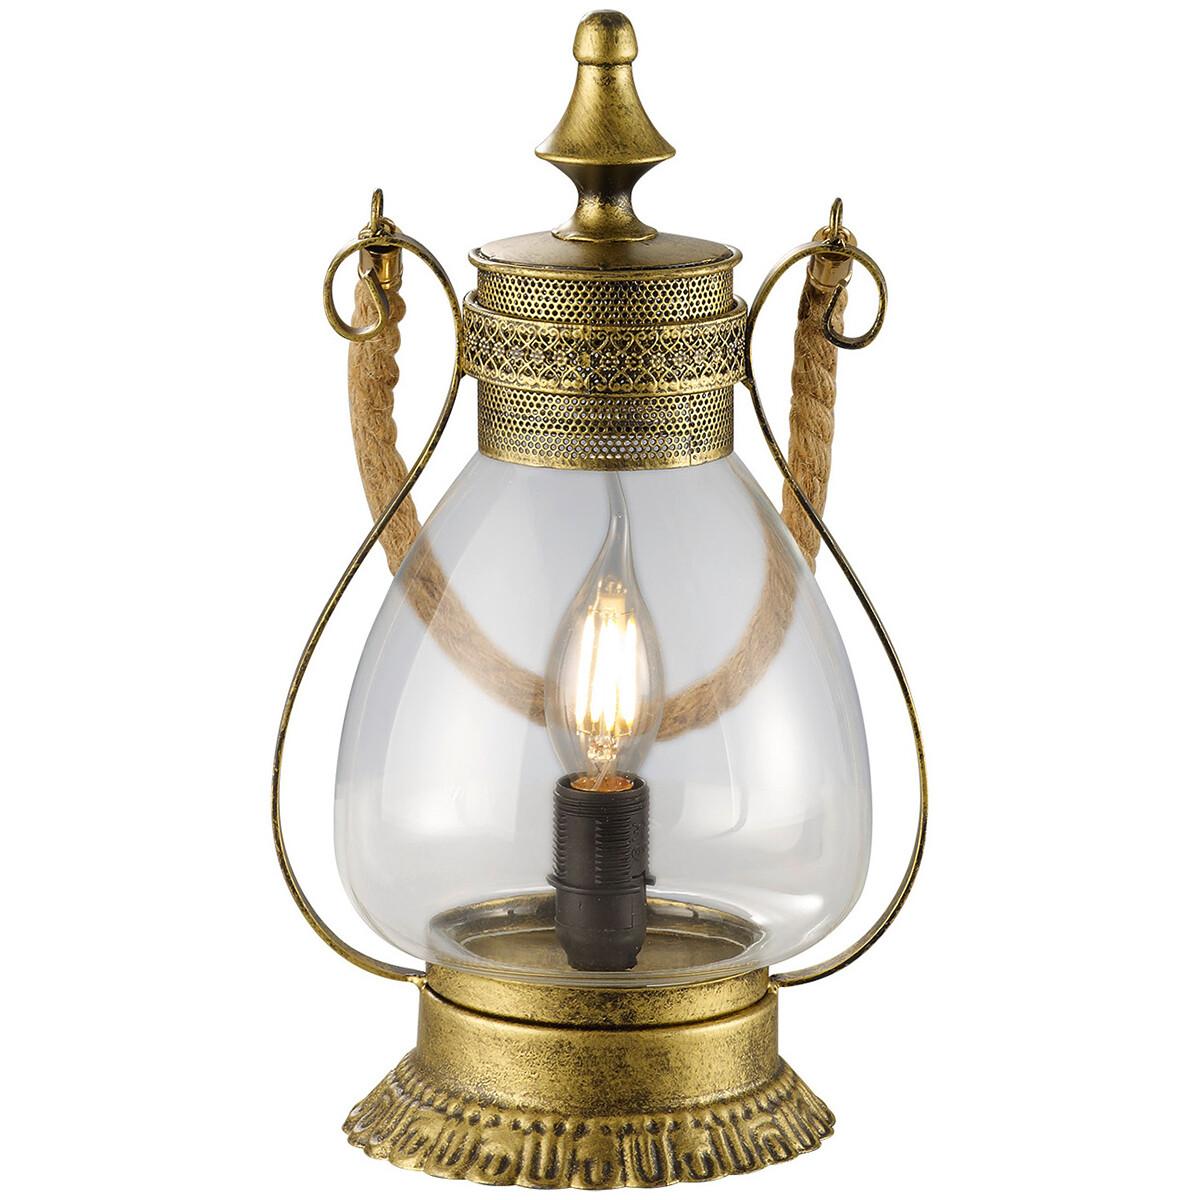 LED Tafellamp - Tafelverlichting - Trion Lindo - E14 Fitting - Rond - Oud Brons - Aluminium